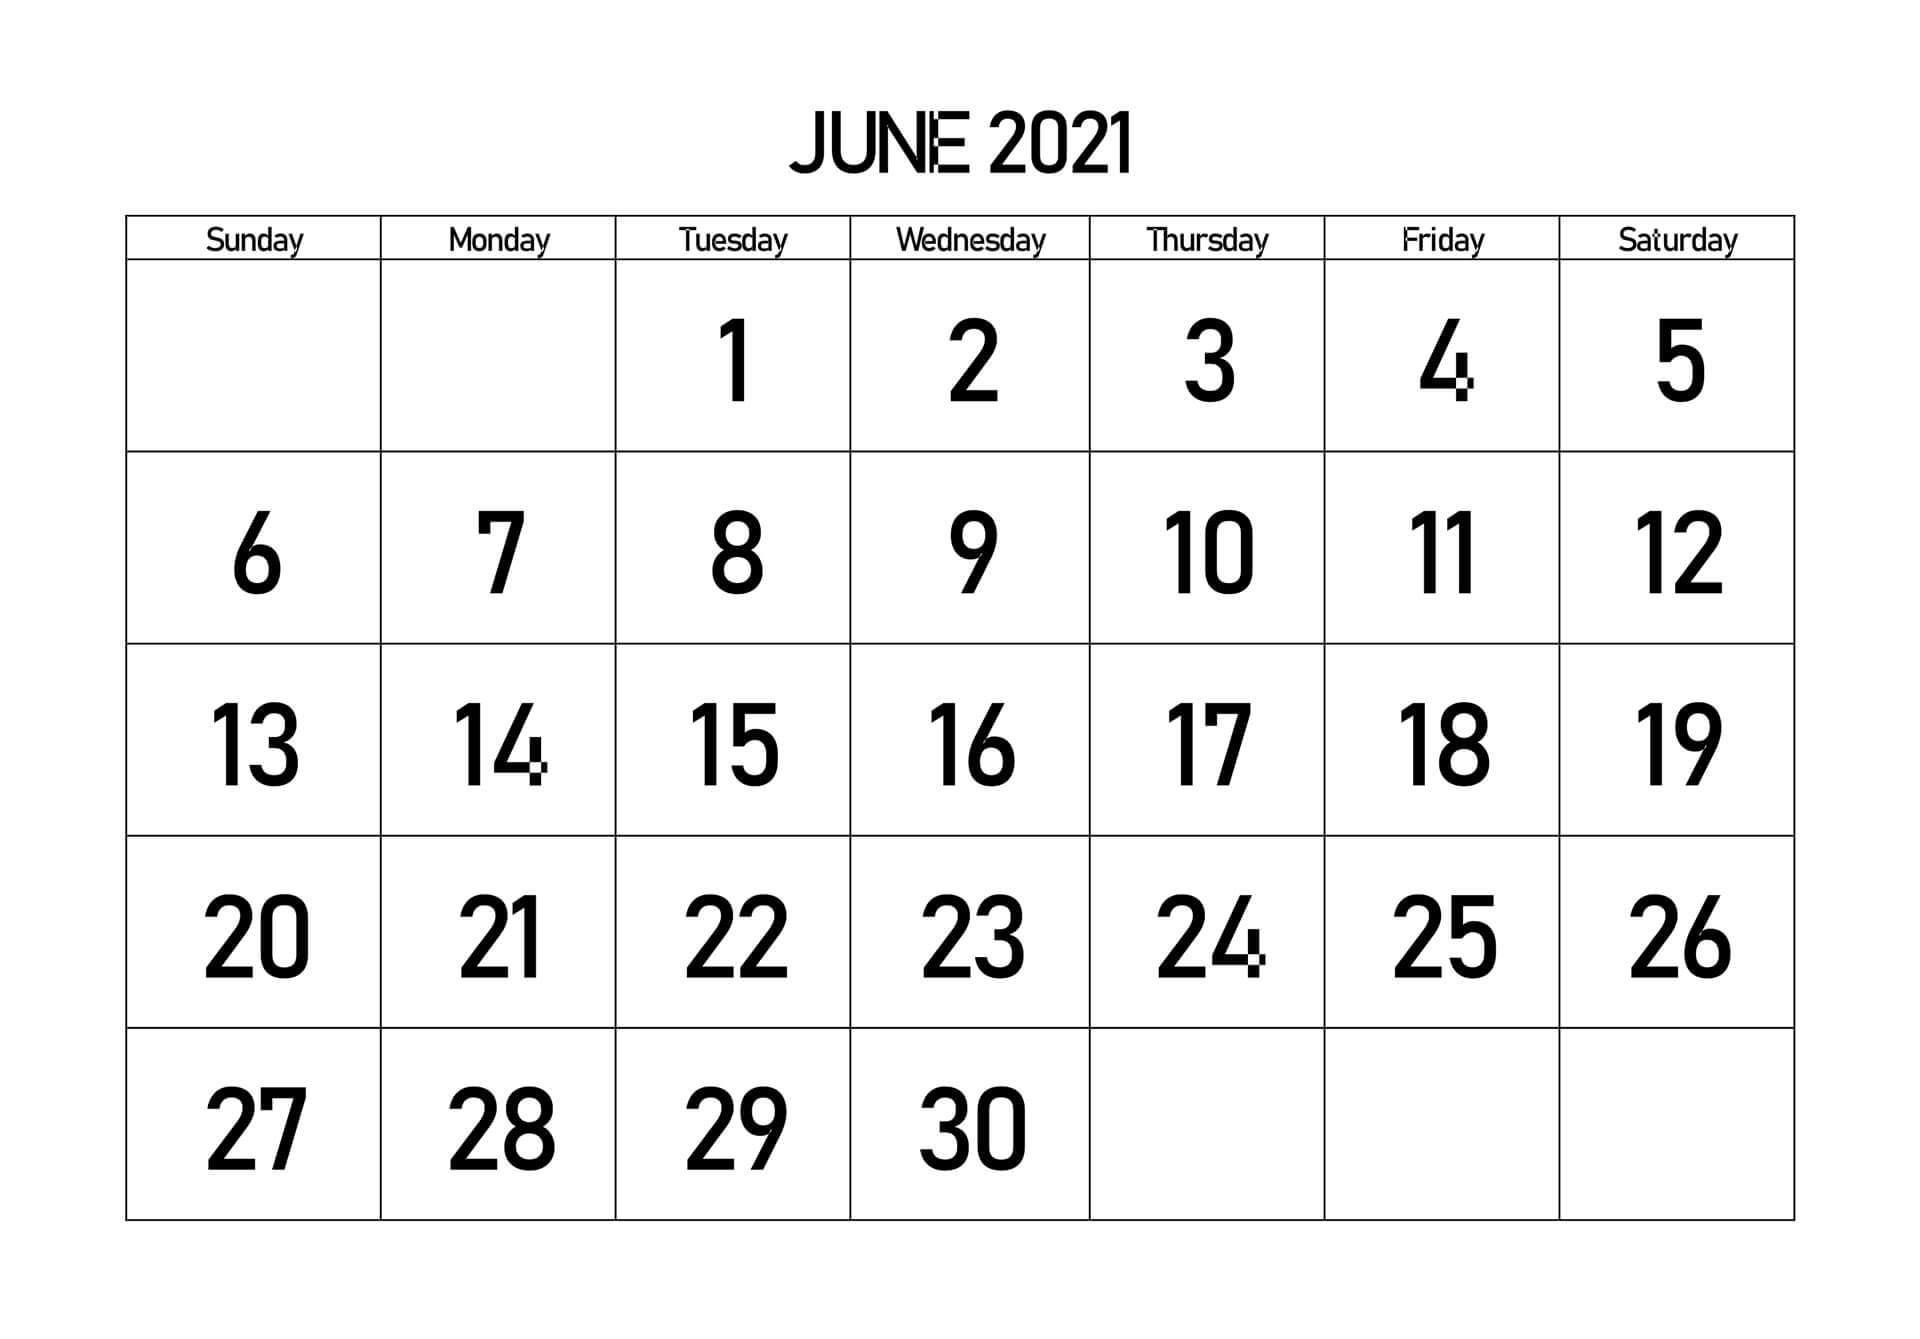 June 2021 Calendar Blank Template